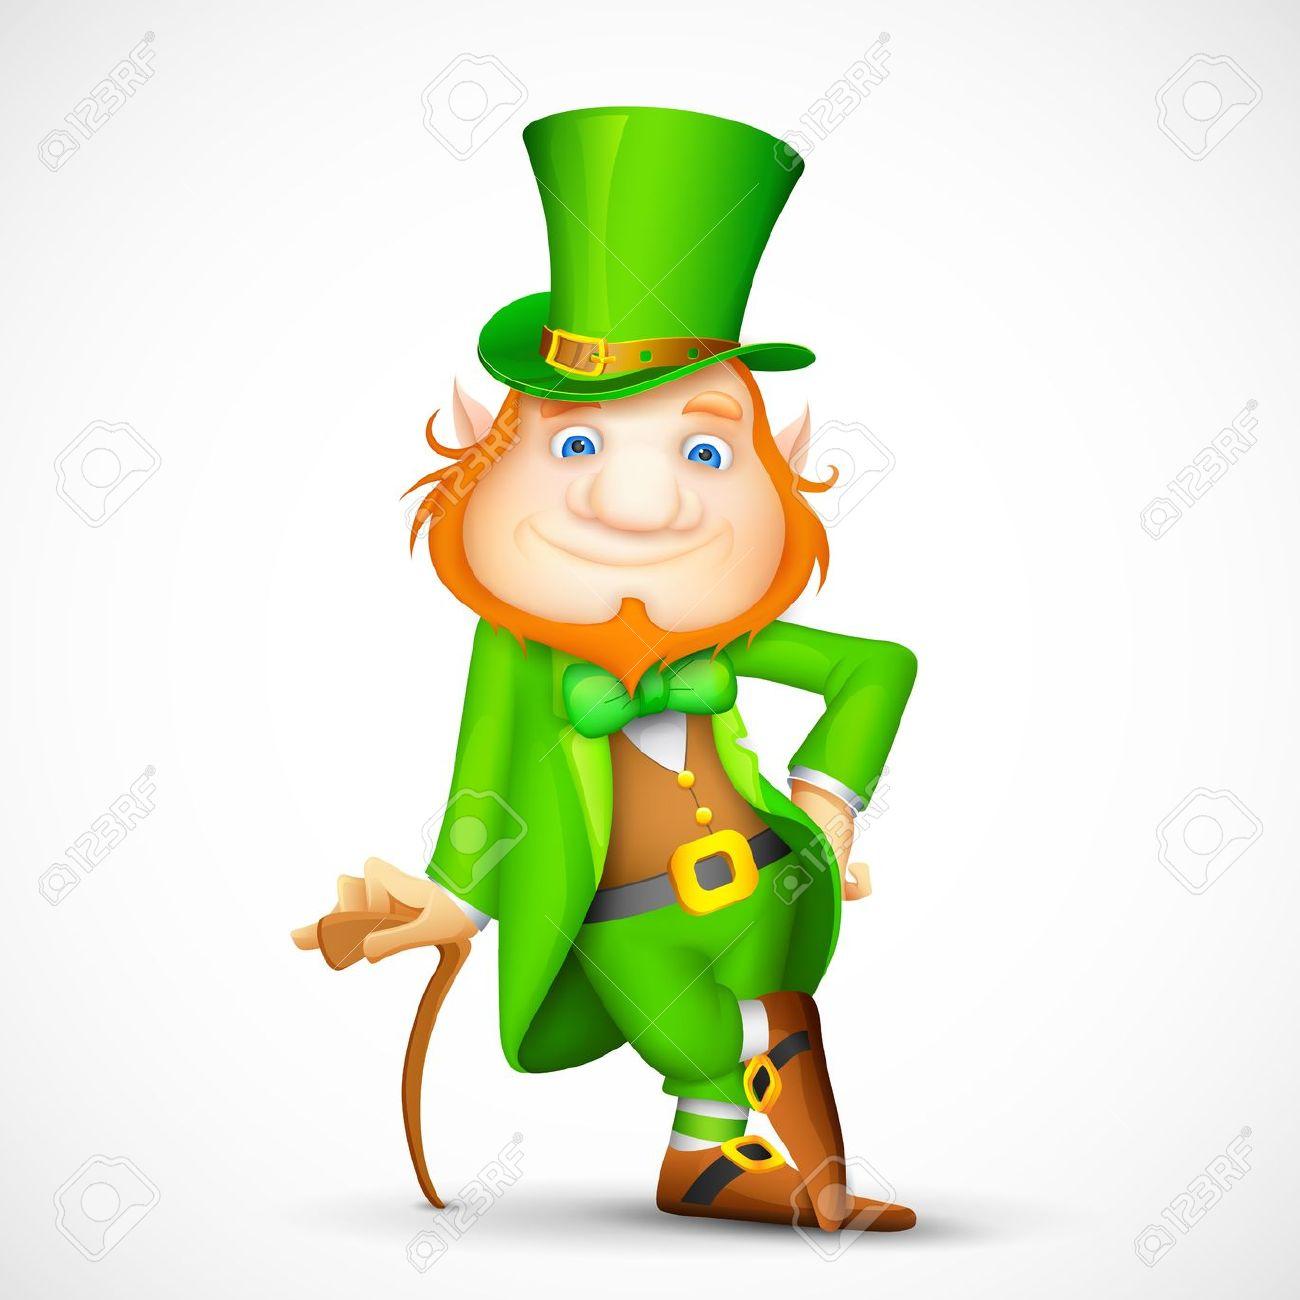 illustration of leprechaun with walking stick for saint patrick